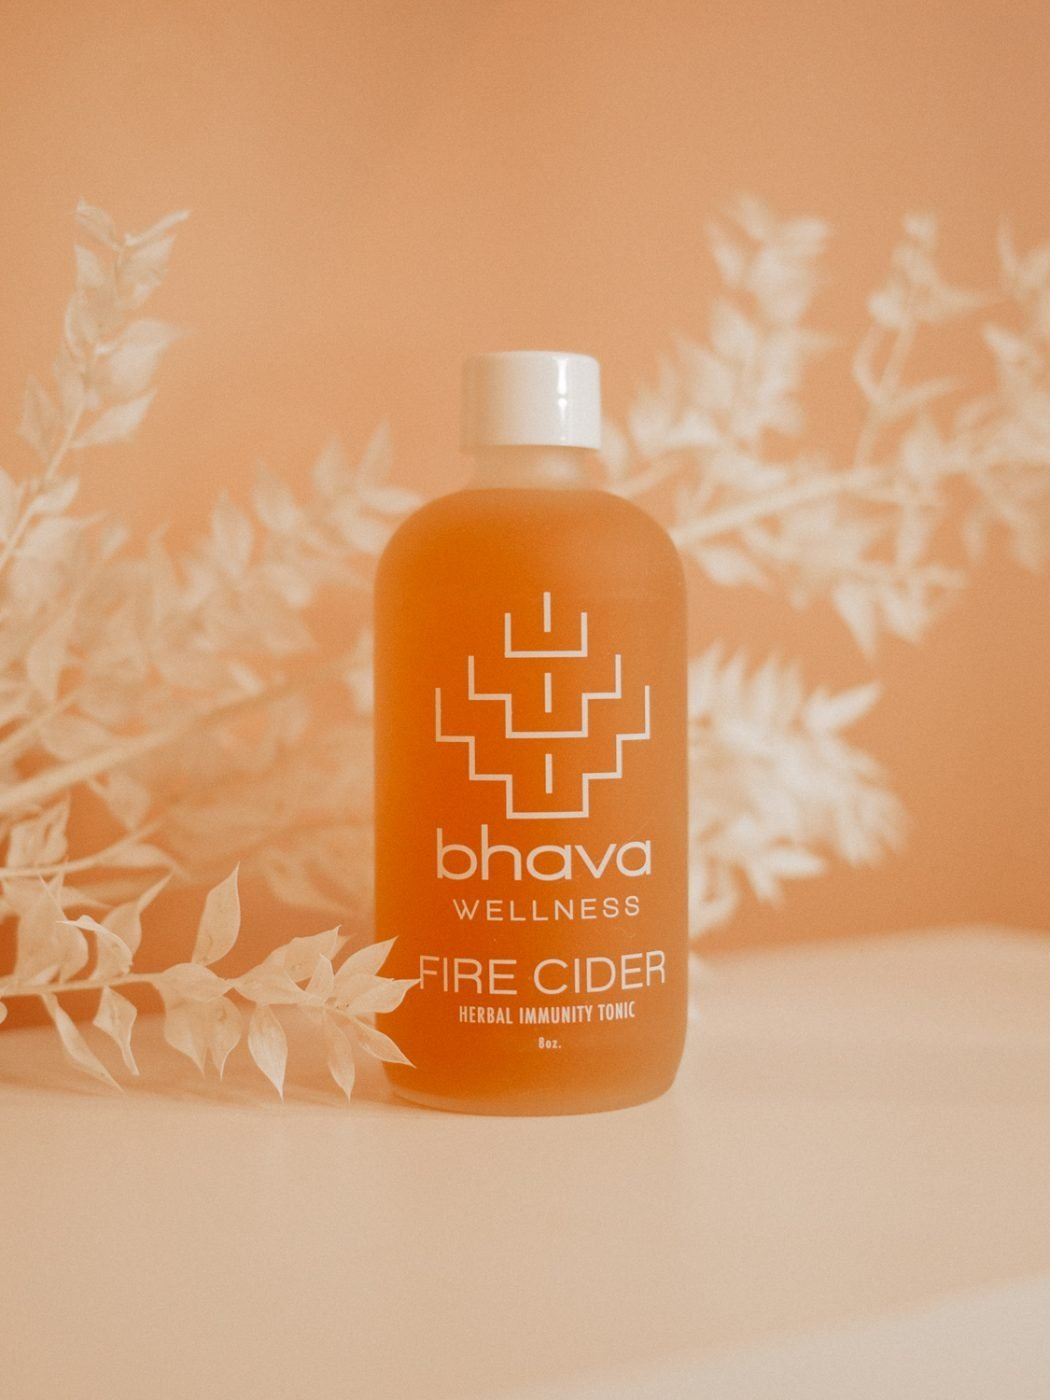 bhava wellness fire cider immunity tonic